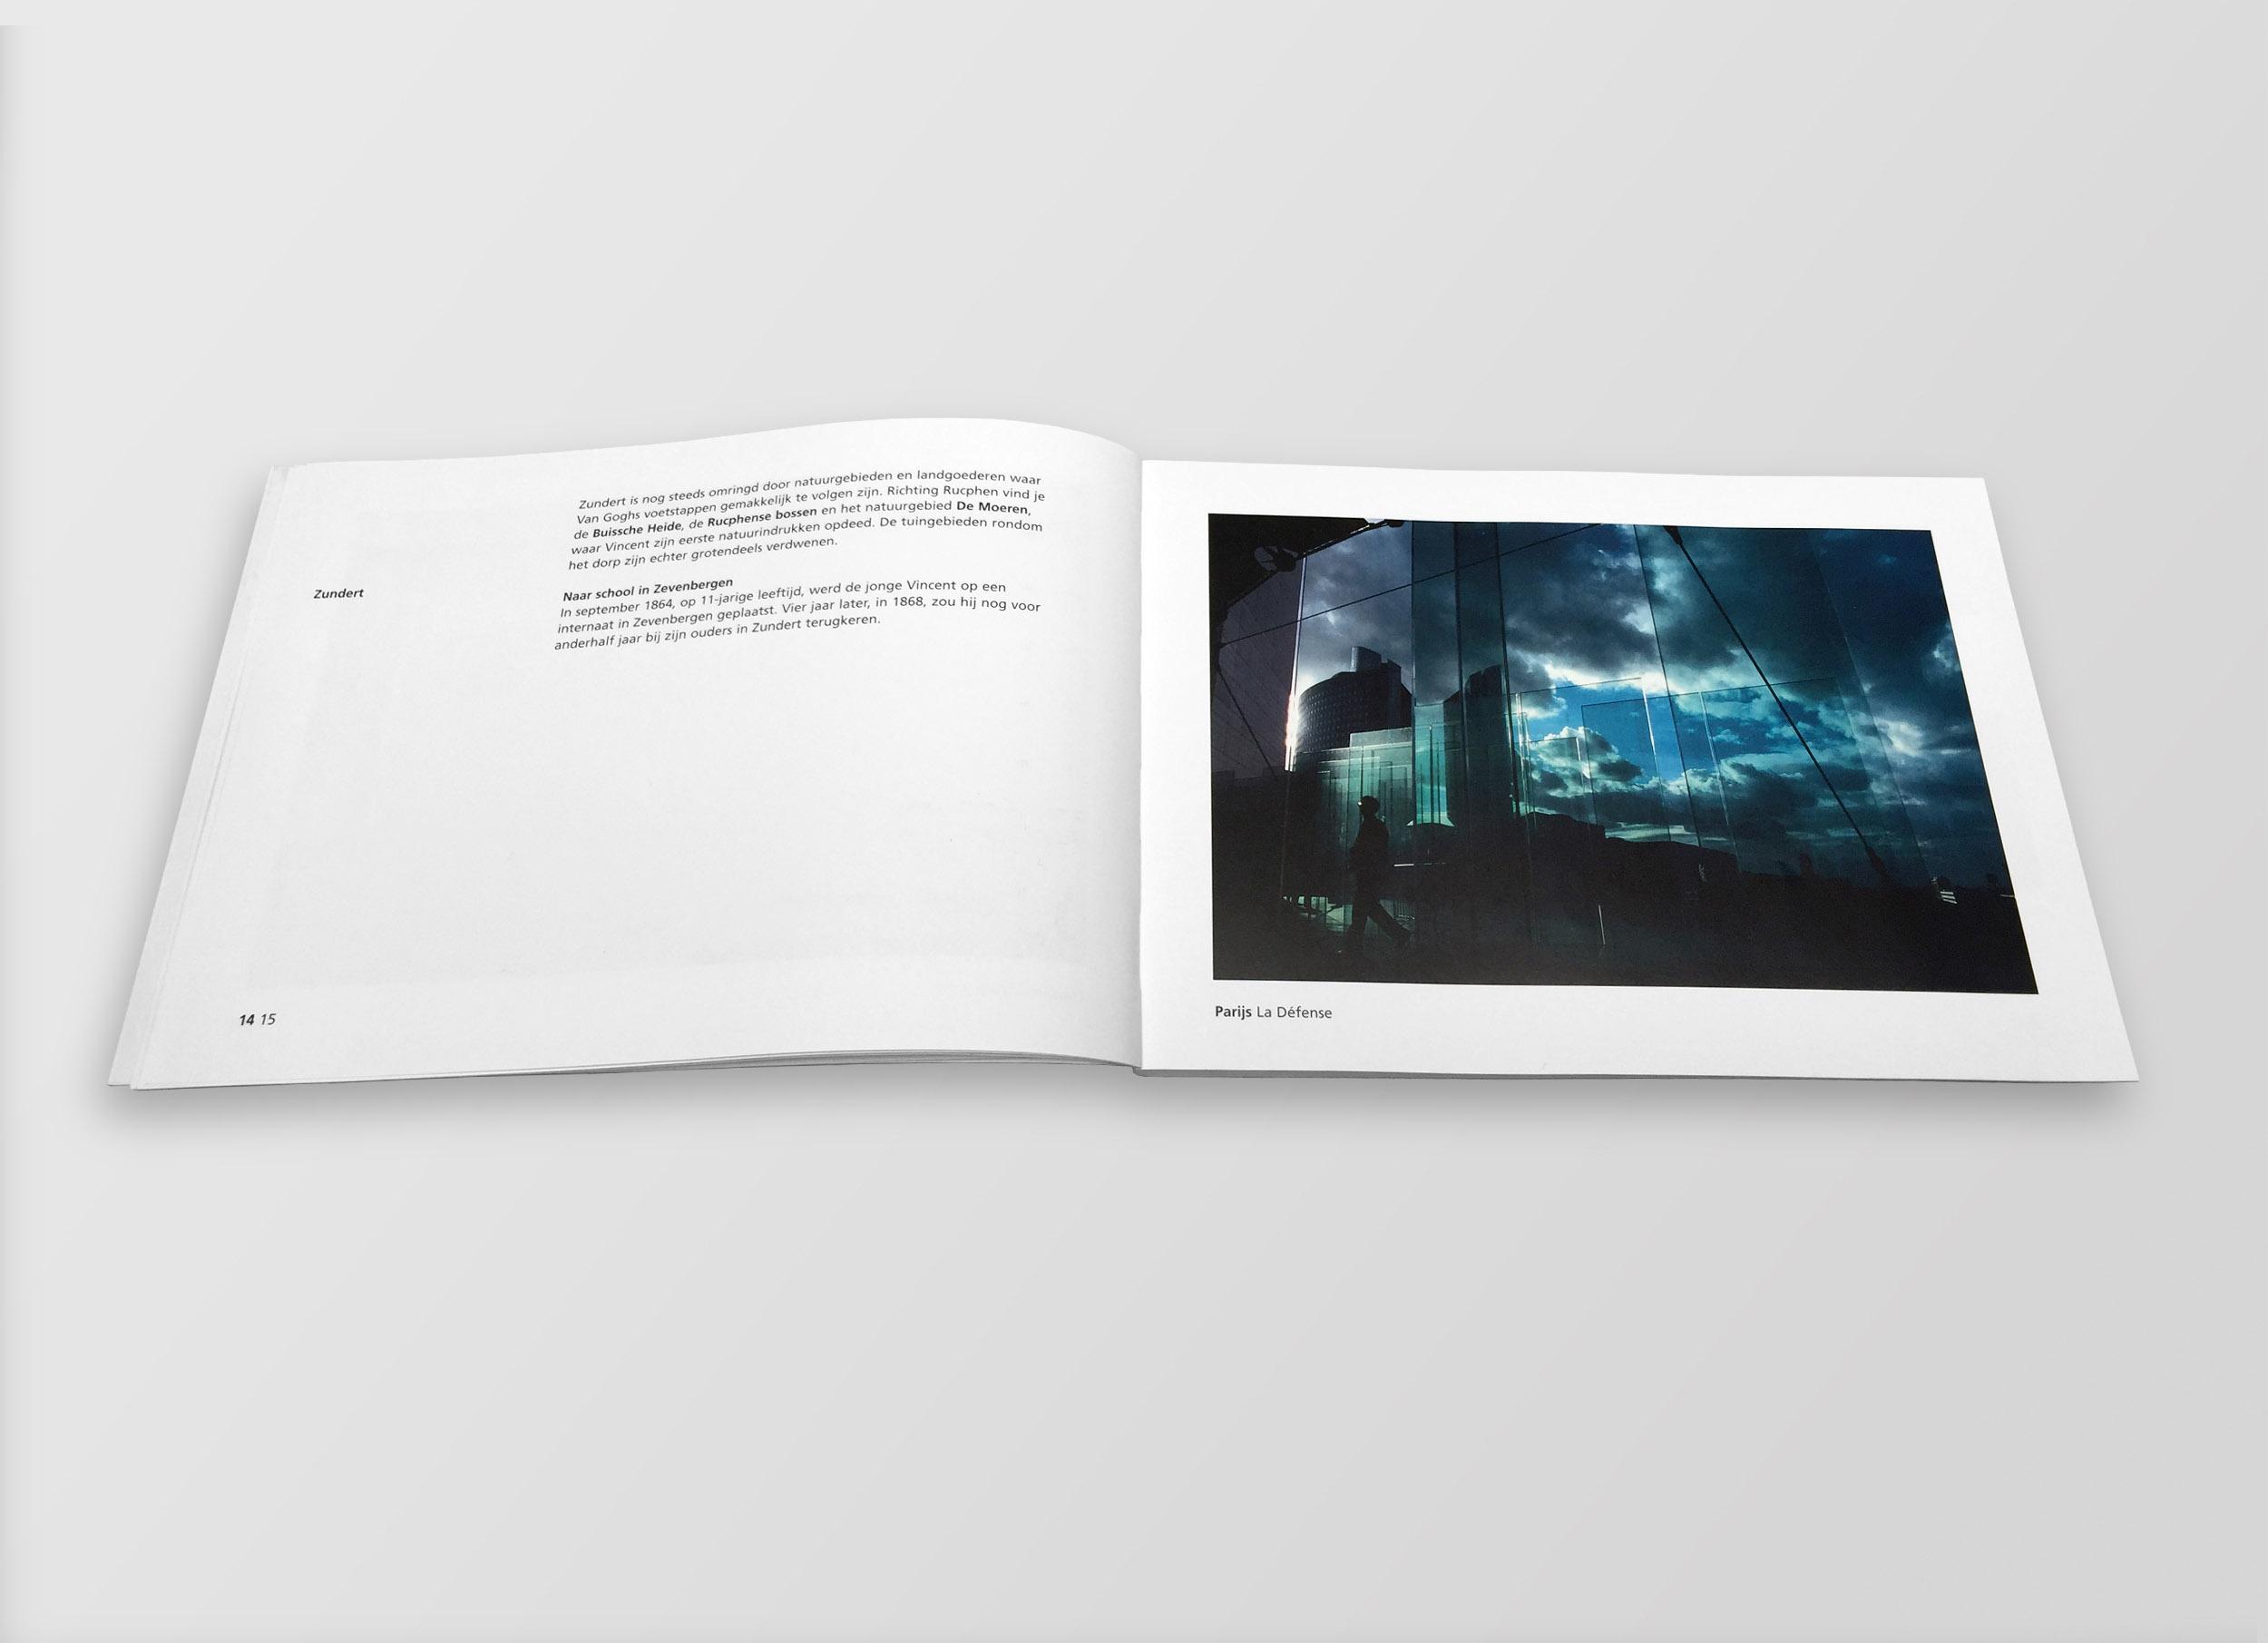 BOOK-VINCENT-006B.jpg